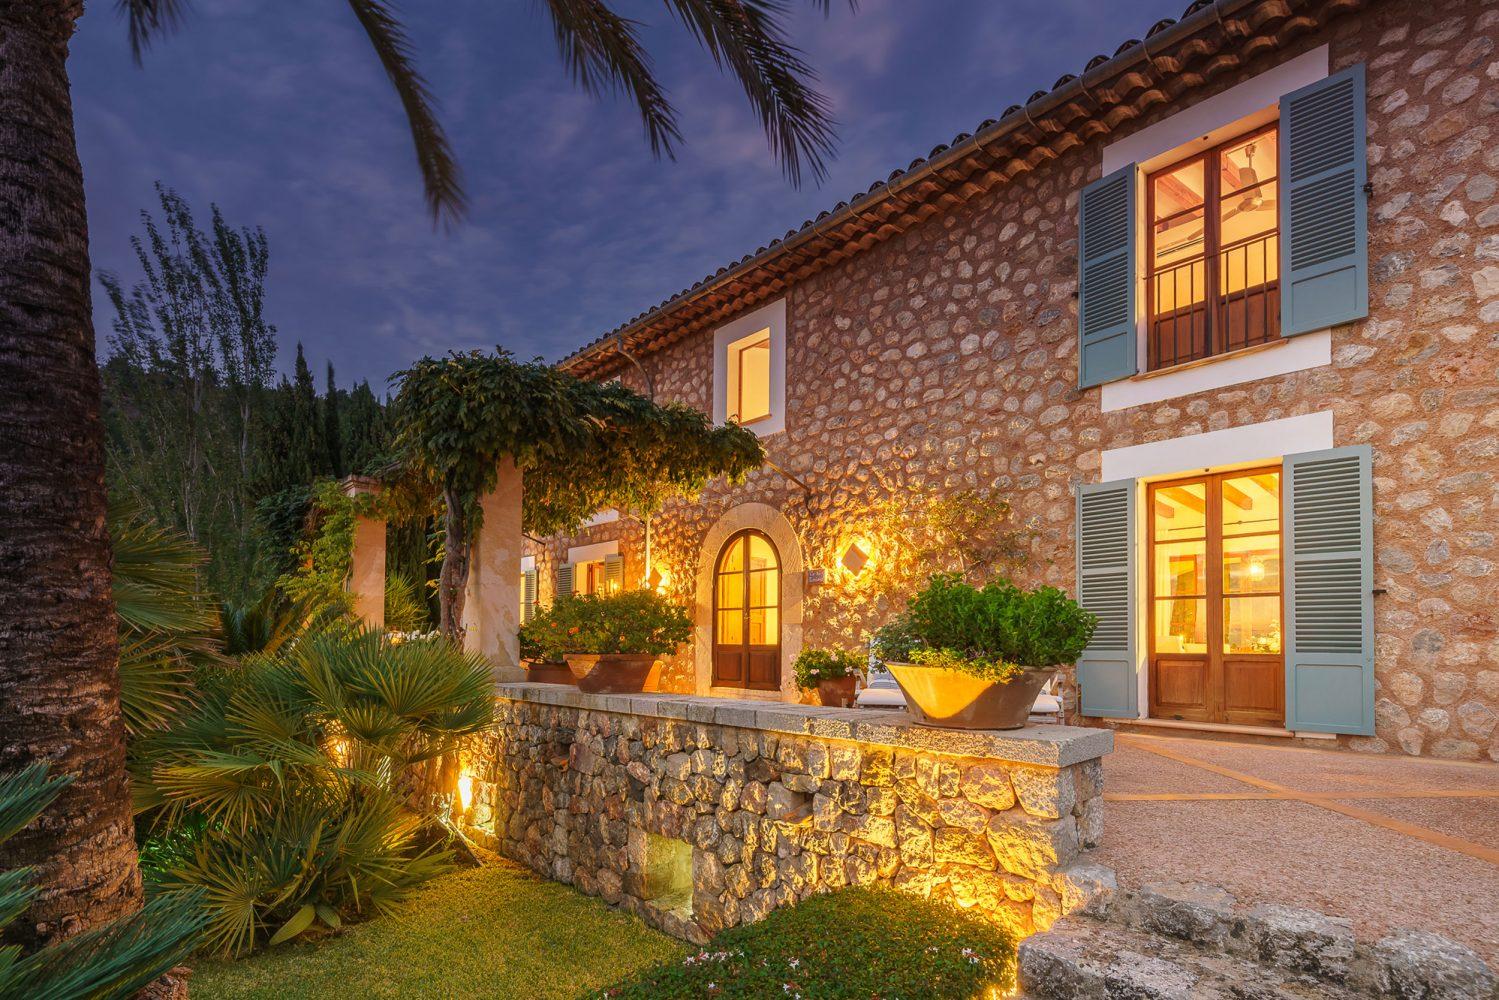 Casa Deia A Gorgeous Luxury Villa In Mallorca Spain To